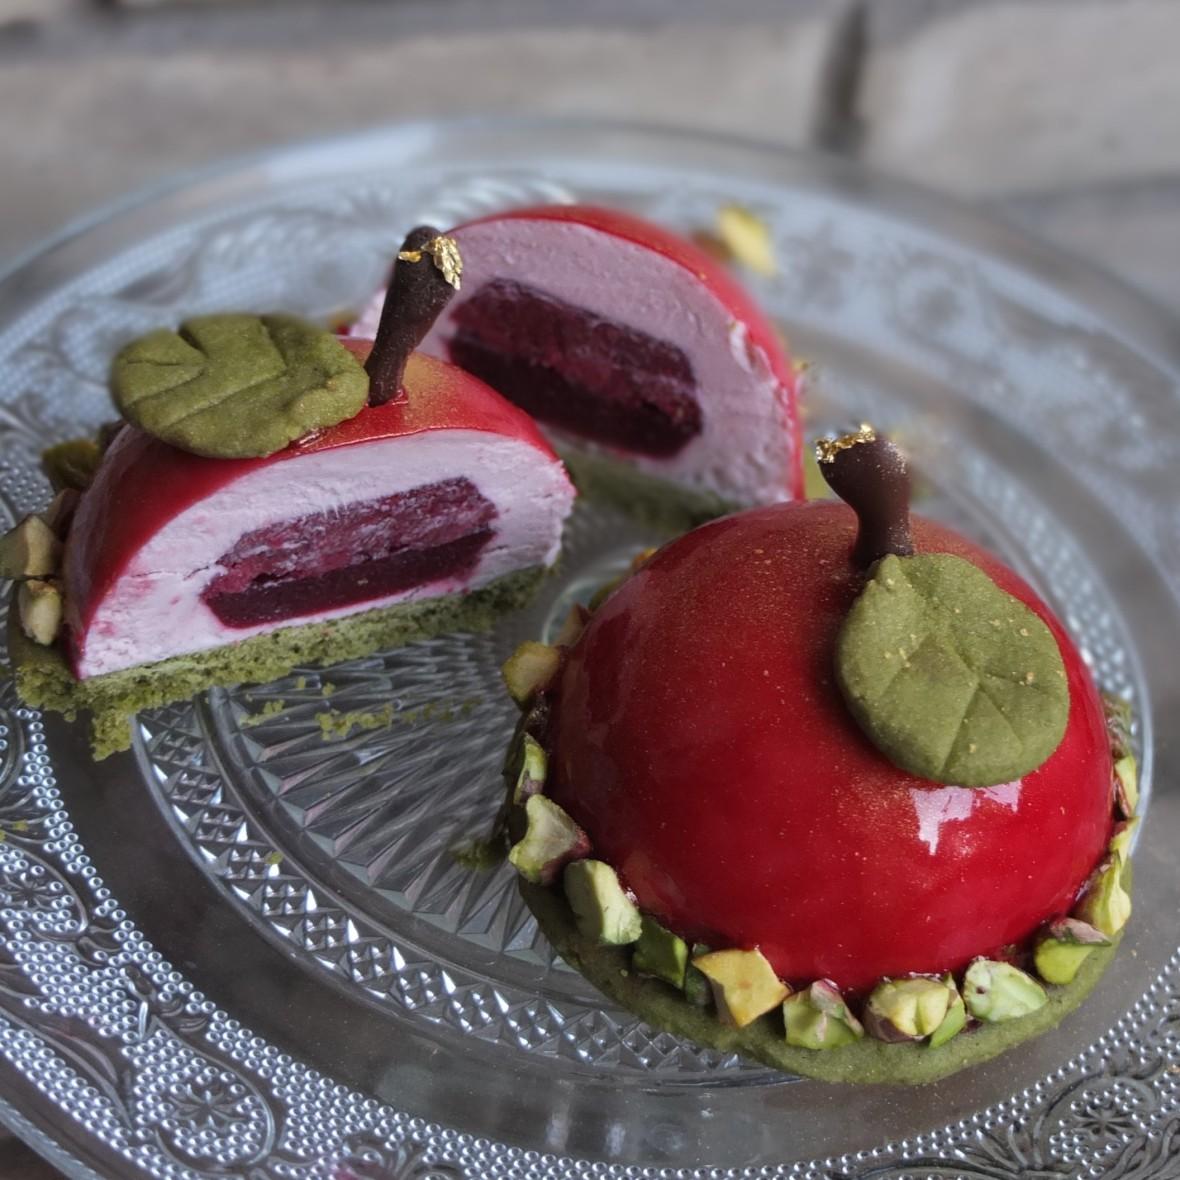 Cherry matcha dome cakes